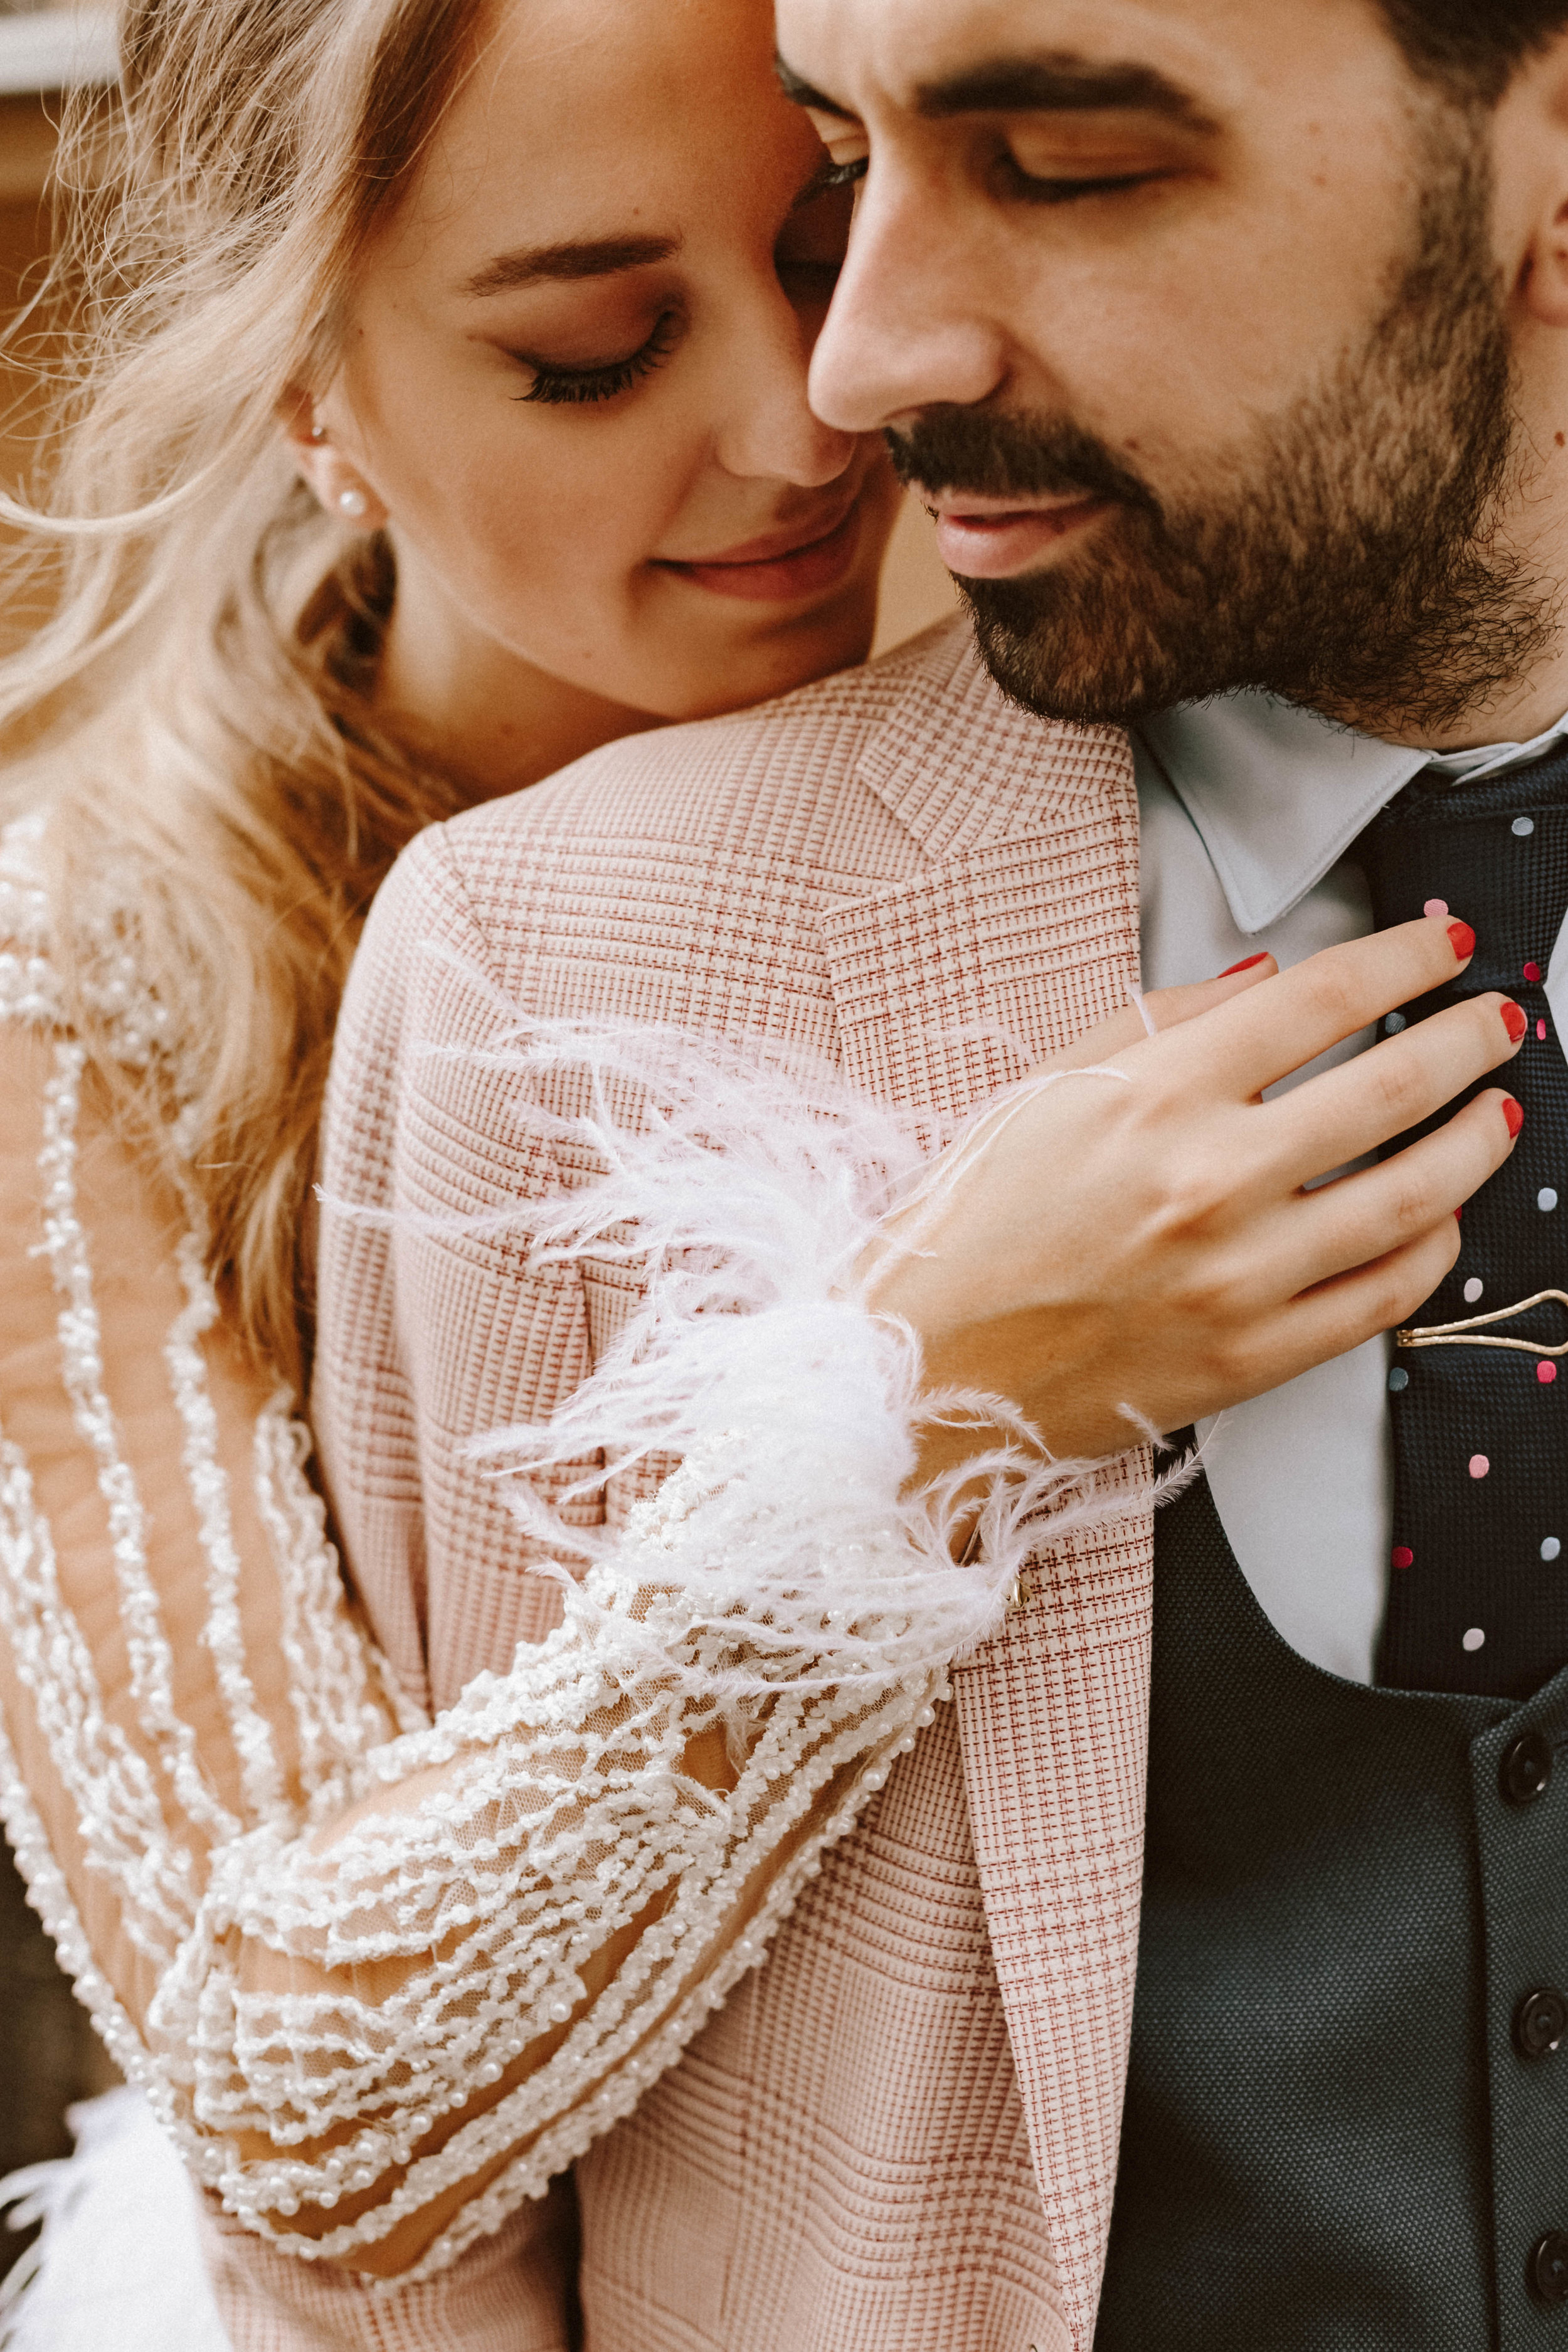 1819-Evelin+Peti-wedding-064-w.jpg